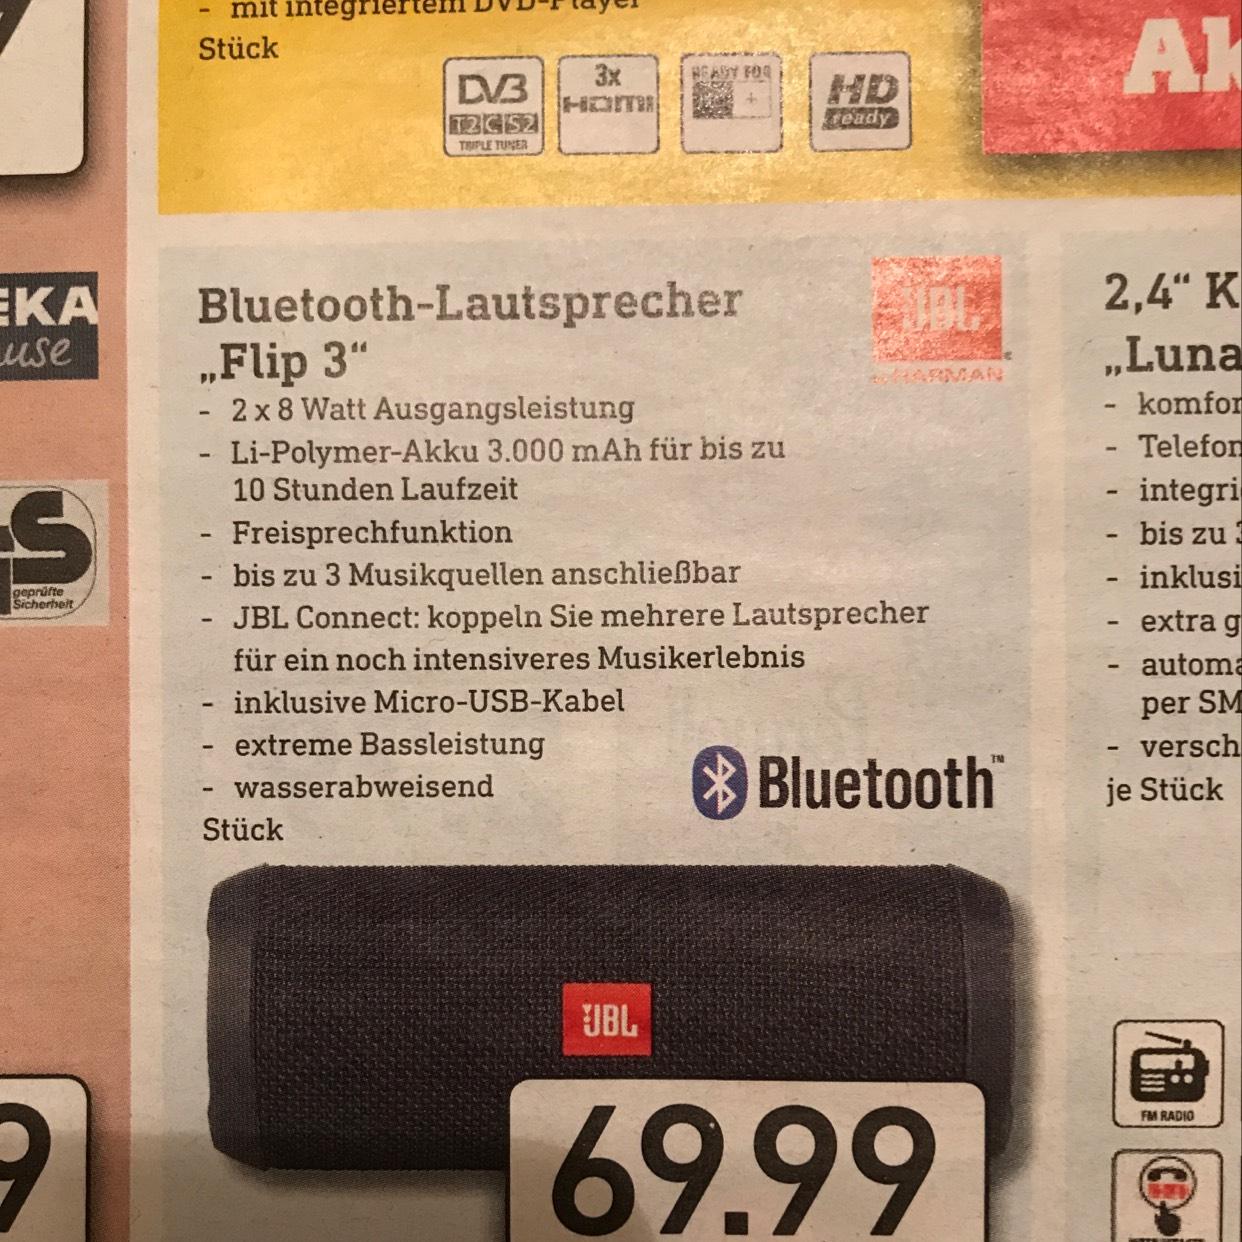 JBL Flip 3 bei Diska evtl. lokal (Kesselsdorf bei Dresden)